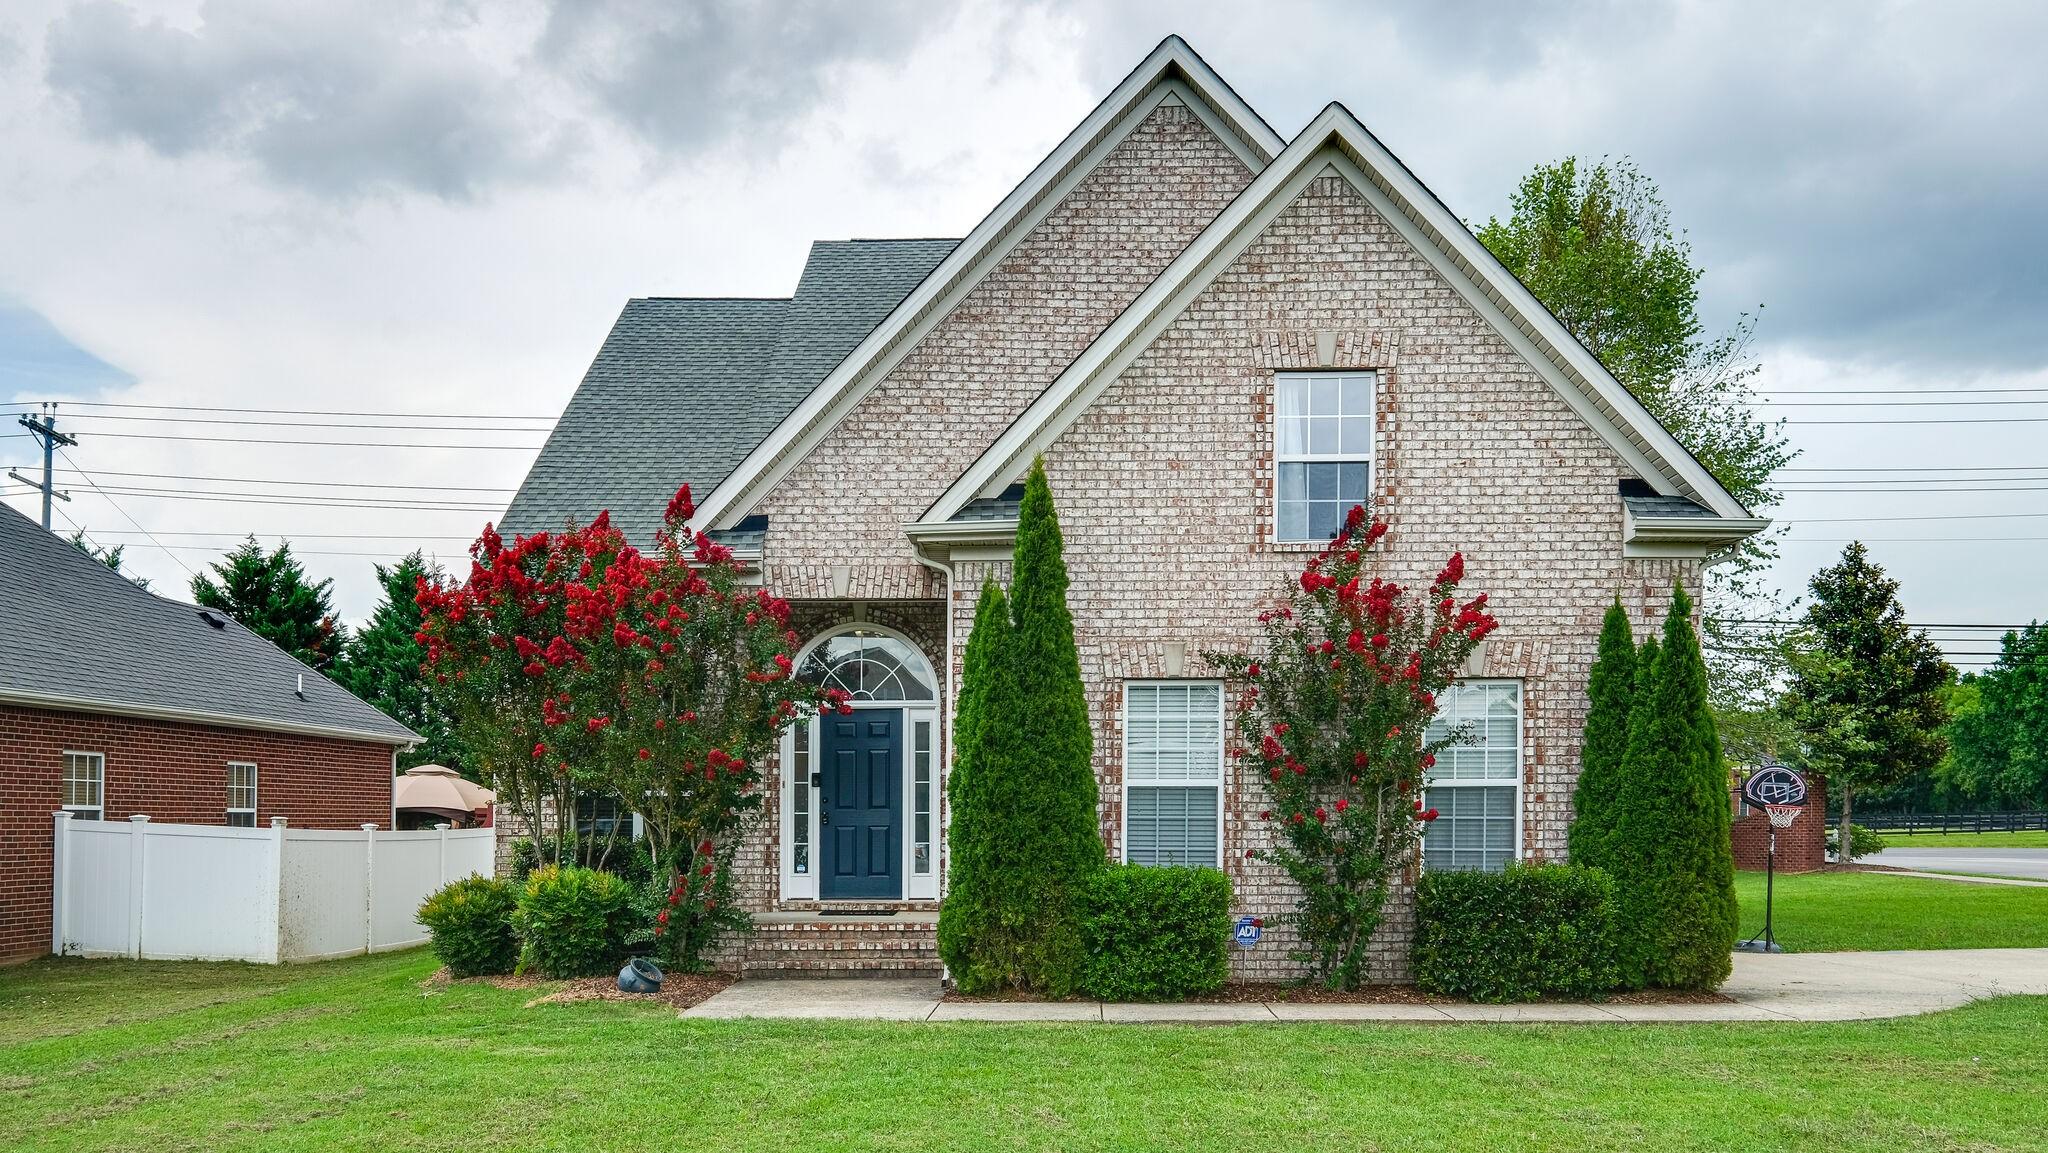 3004 Shady Glen Cir Property Photo - Murfreesboro, TN real estate listing